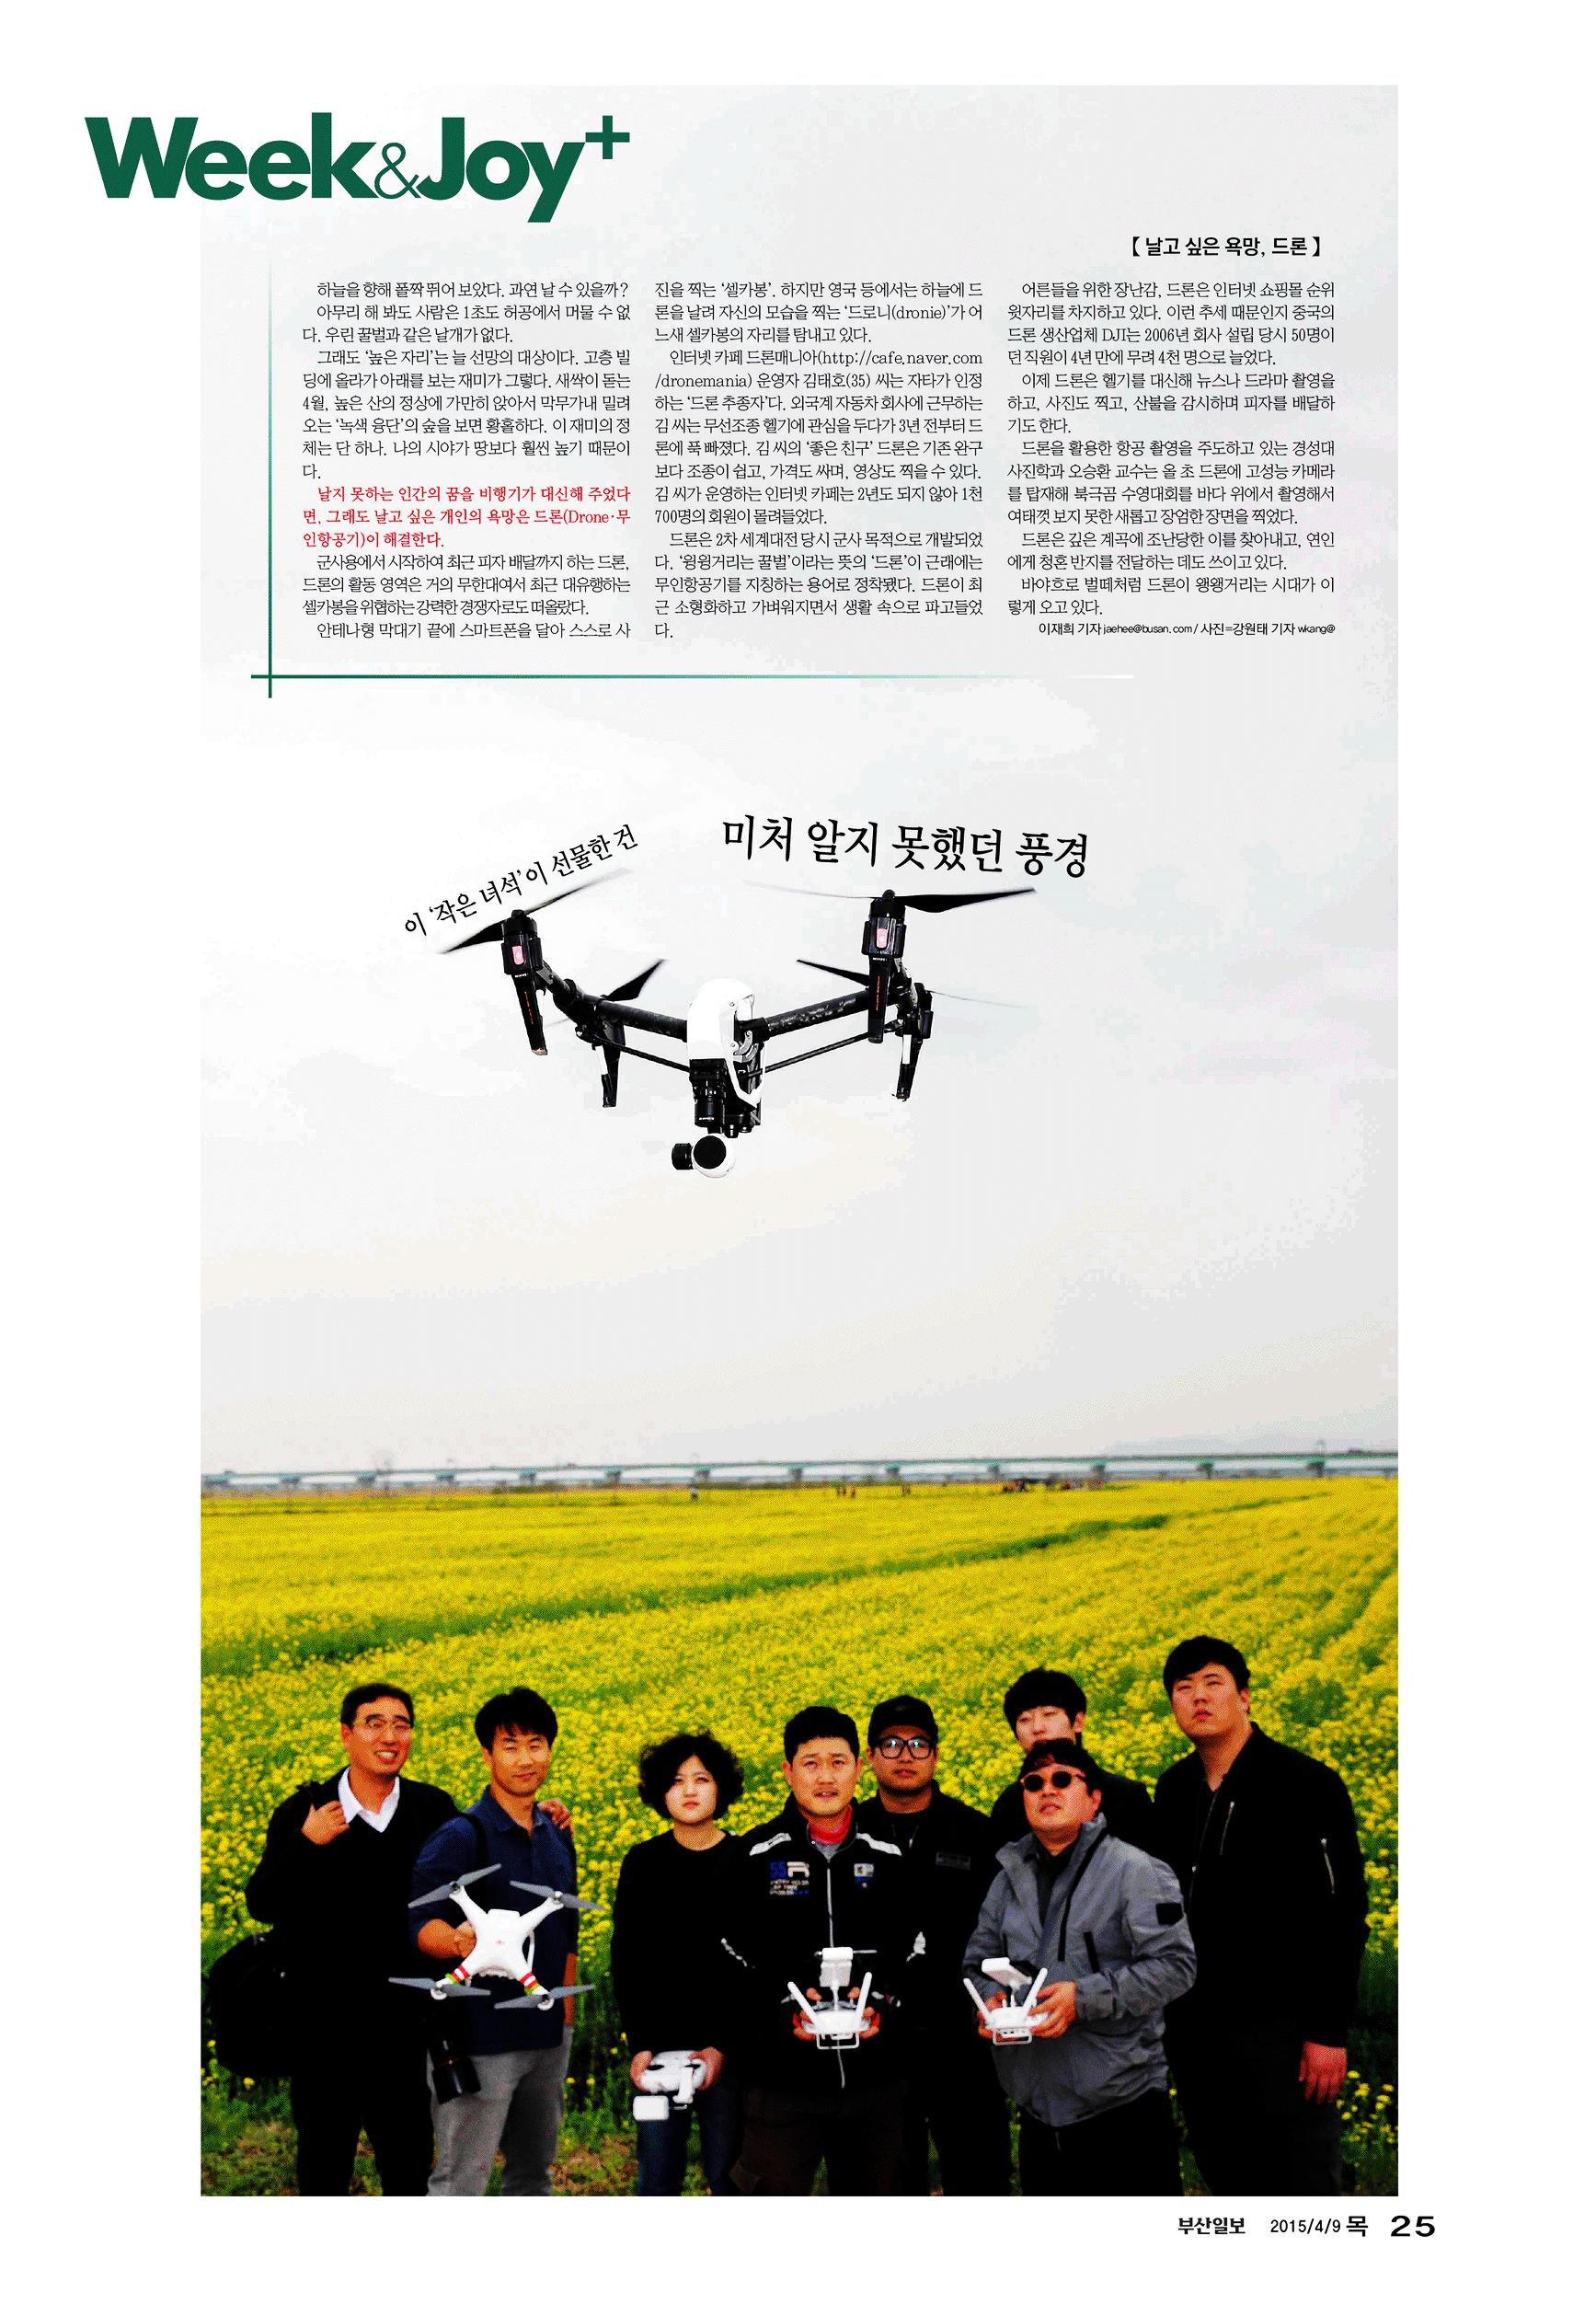 Thu Apr 9 2015 - 25면